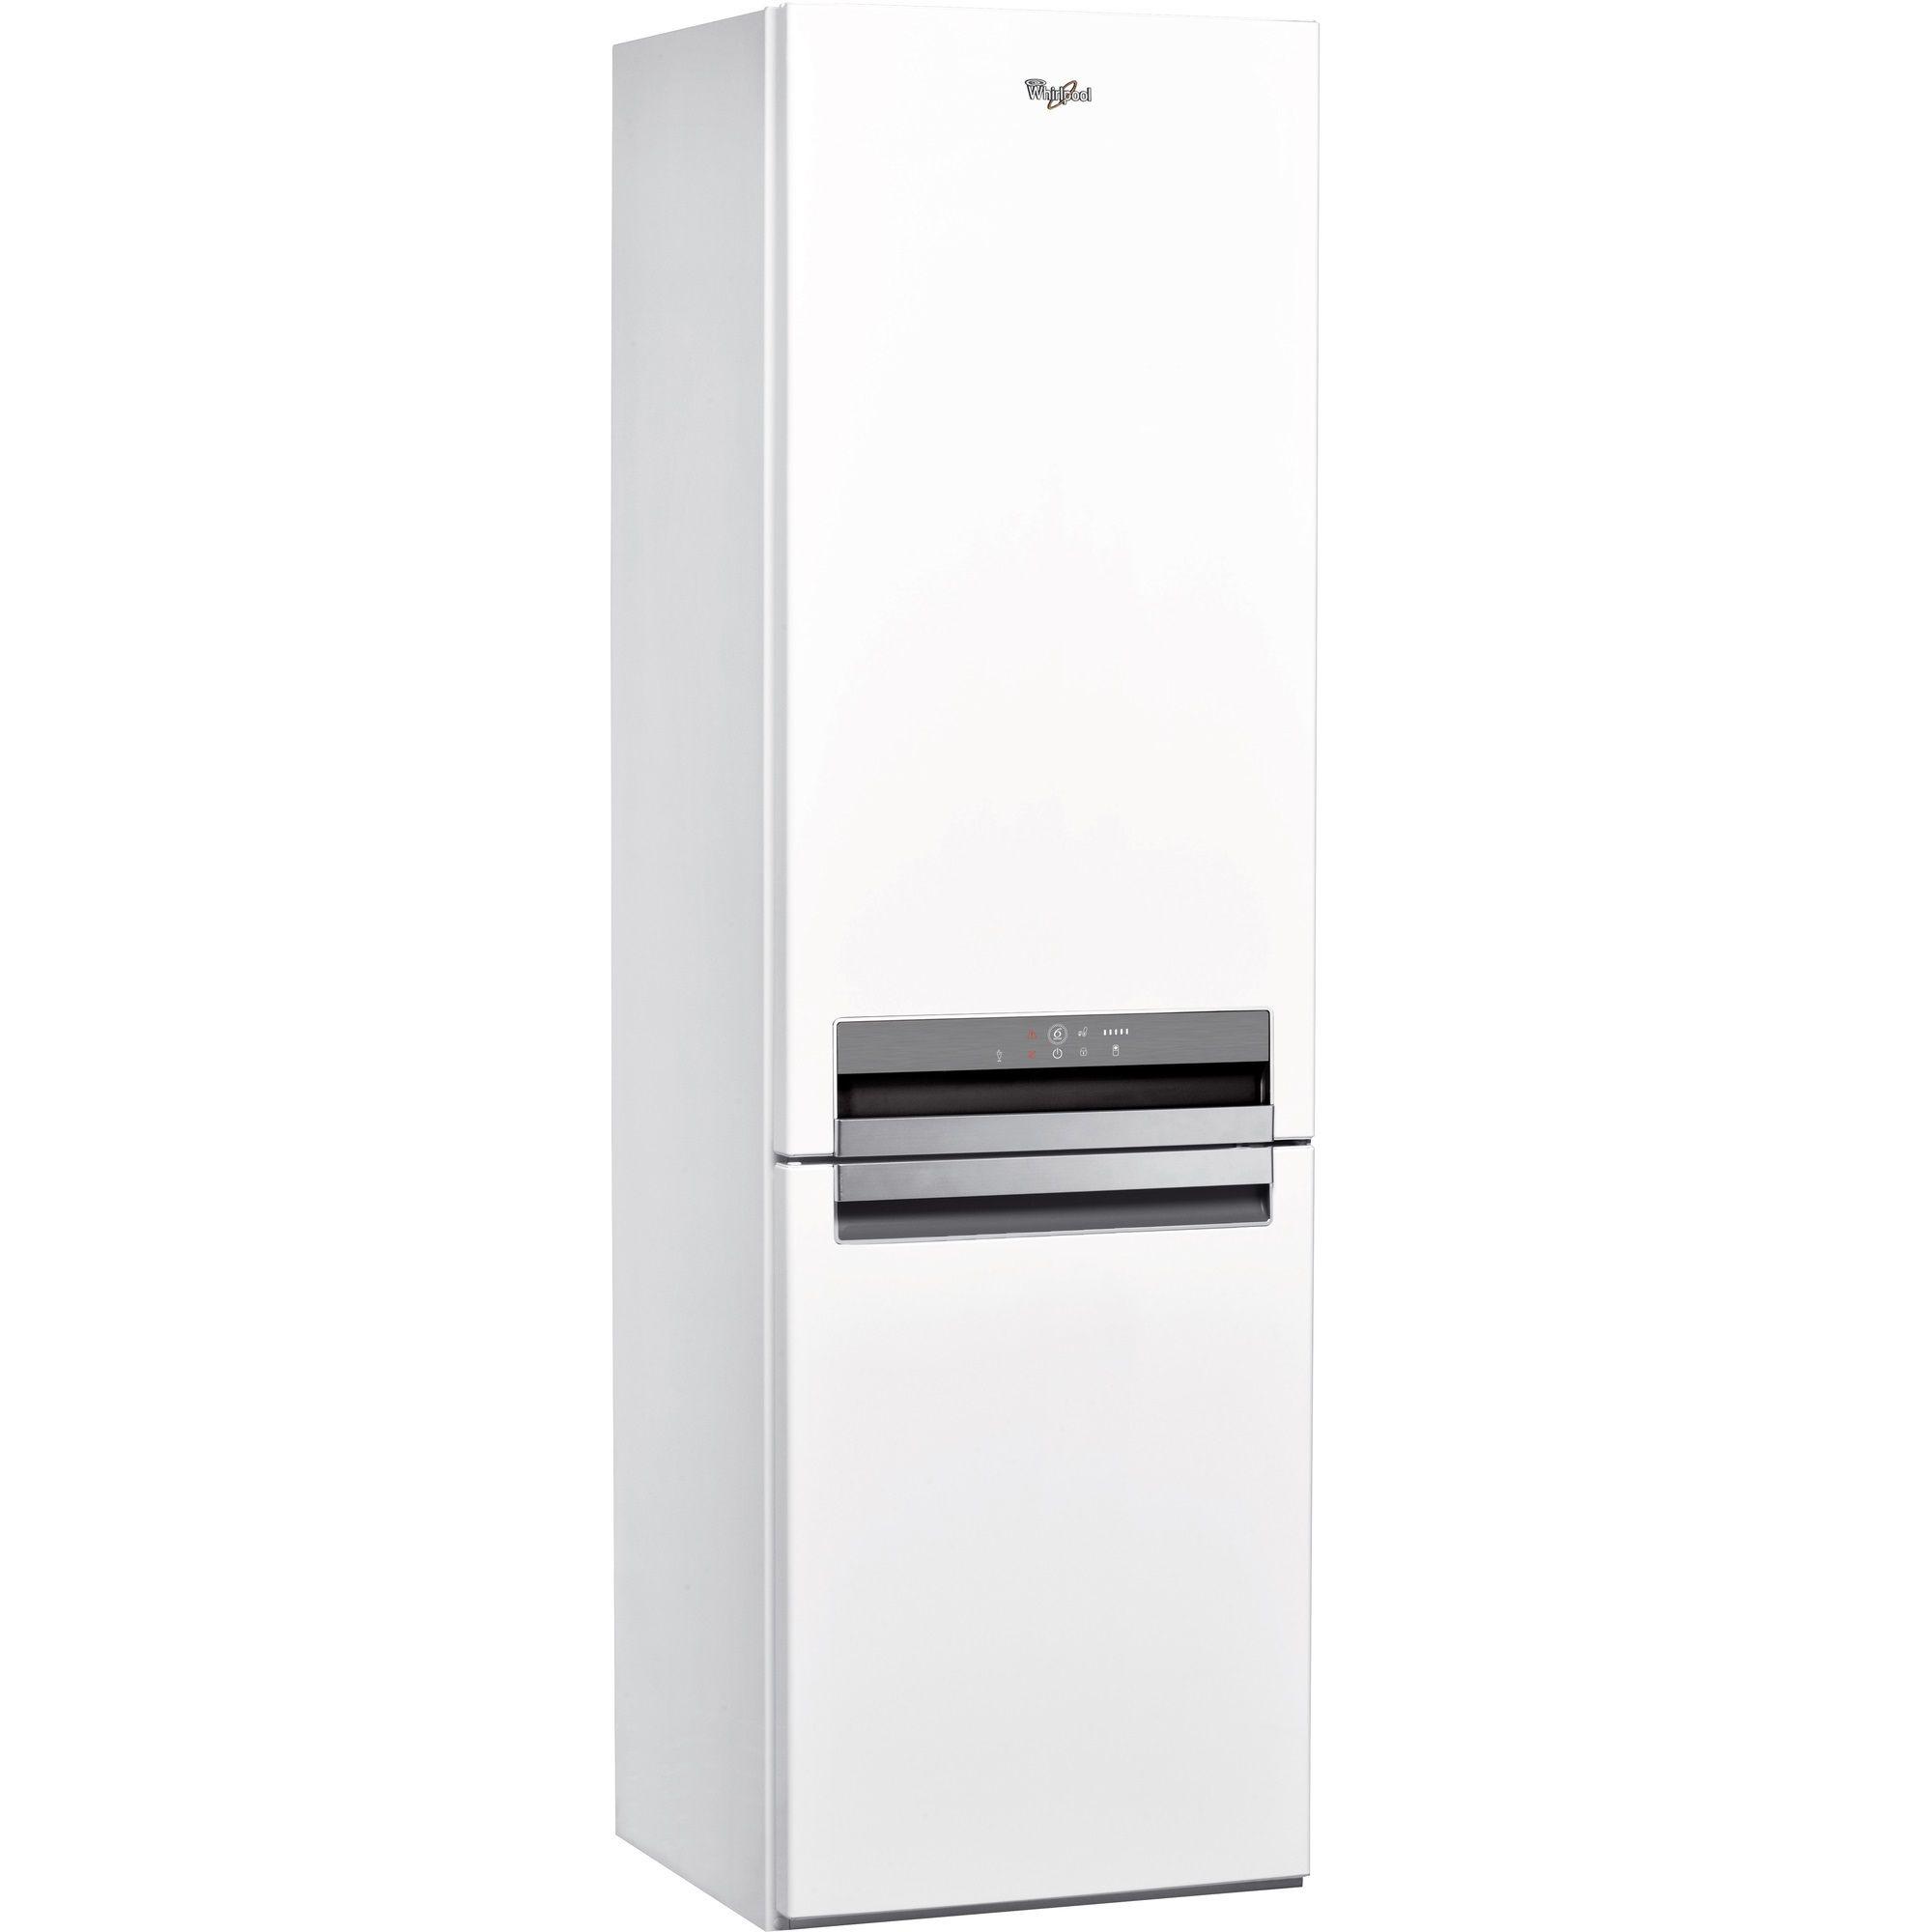 Хладилник с фризер Whirlpool BSNF 8121 W, 315 л, Клас A+, 6th Sense, Supreme NoFrost, H 188.5 см, Бял